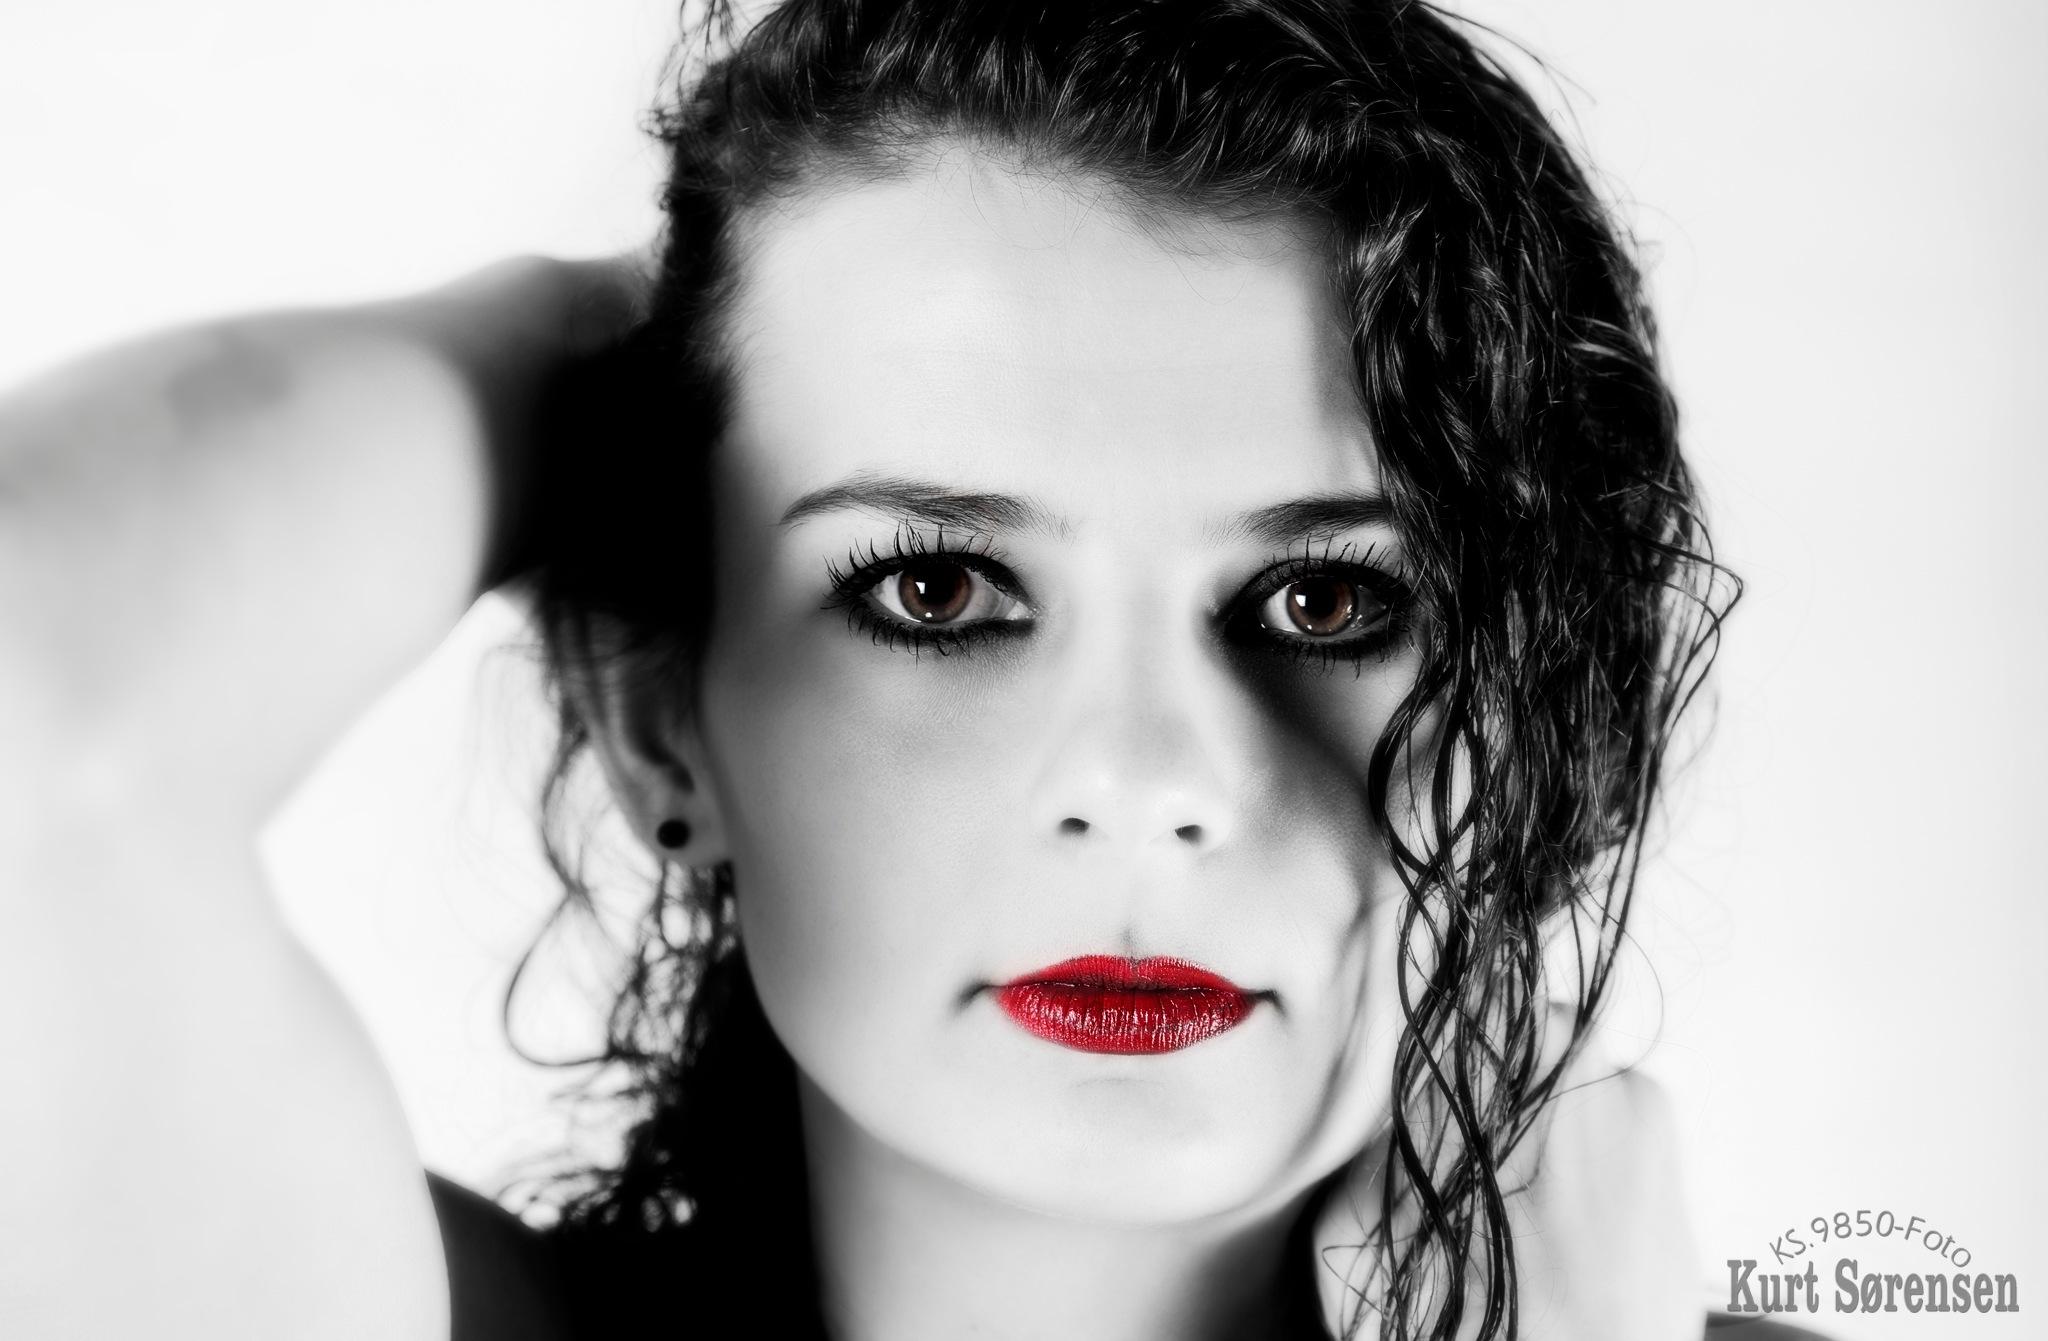 Red lips by Kurt Sørensen